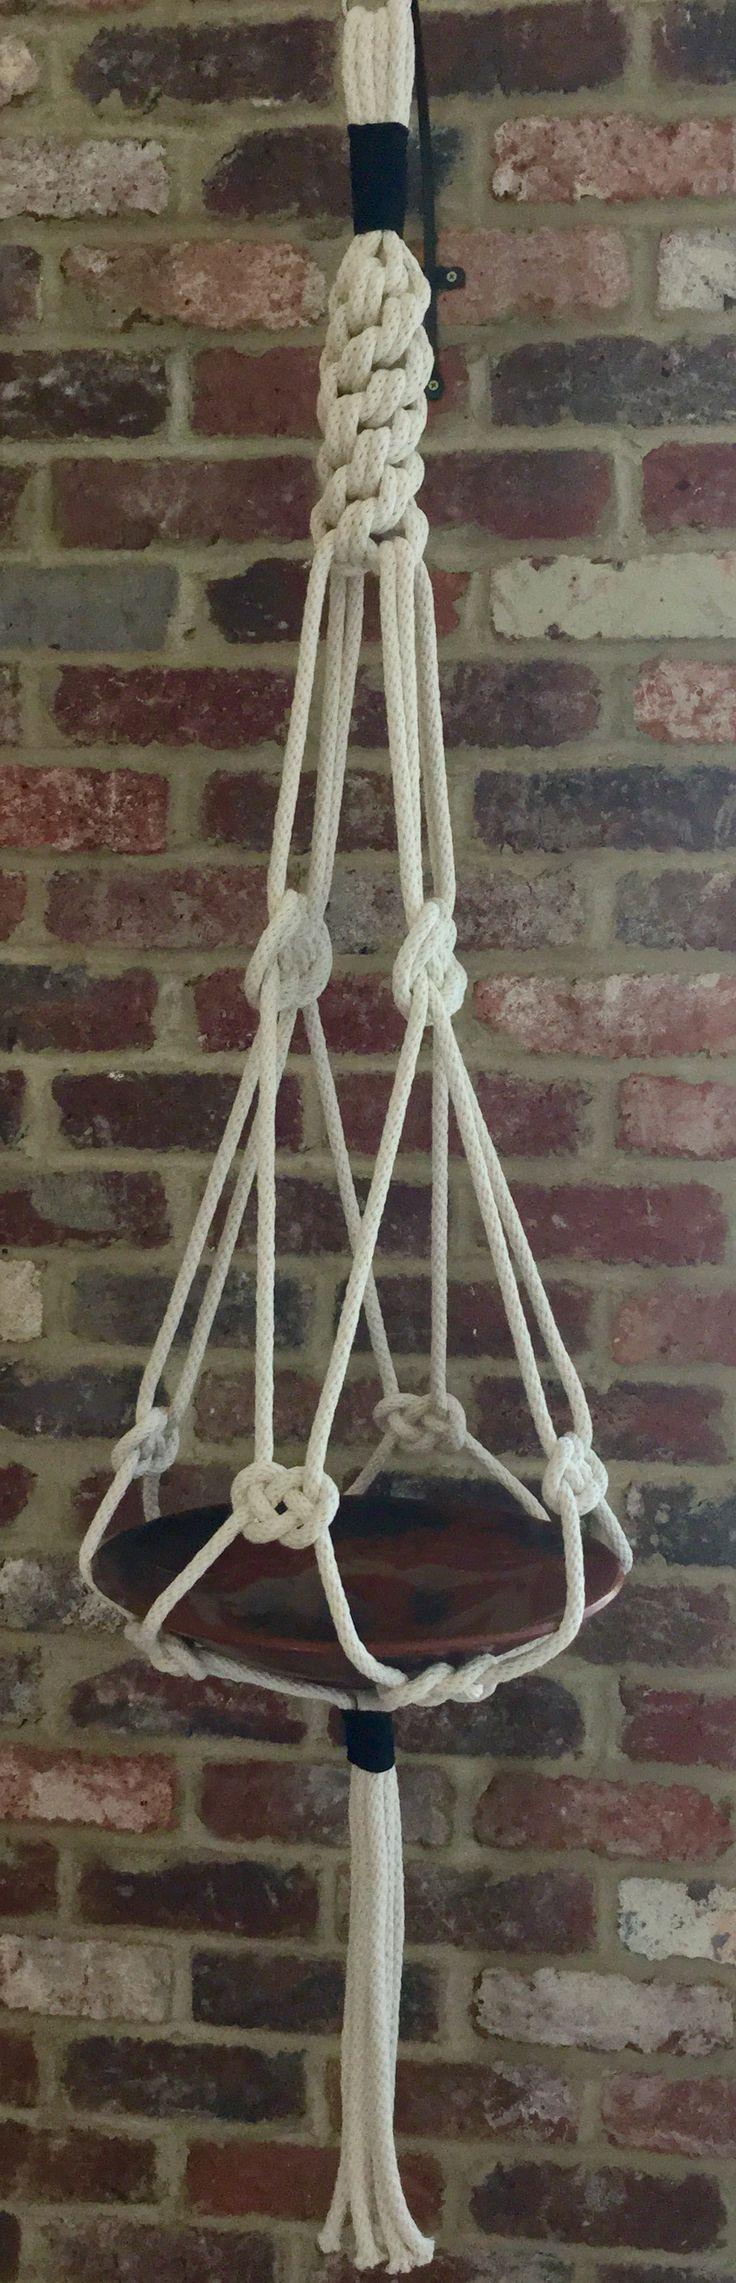 Handmade natural cotton macrame. Visit Lorna and Lila on Facebook